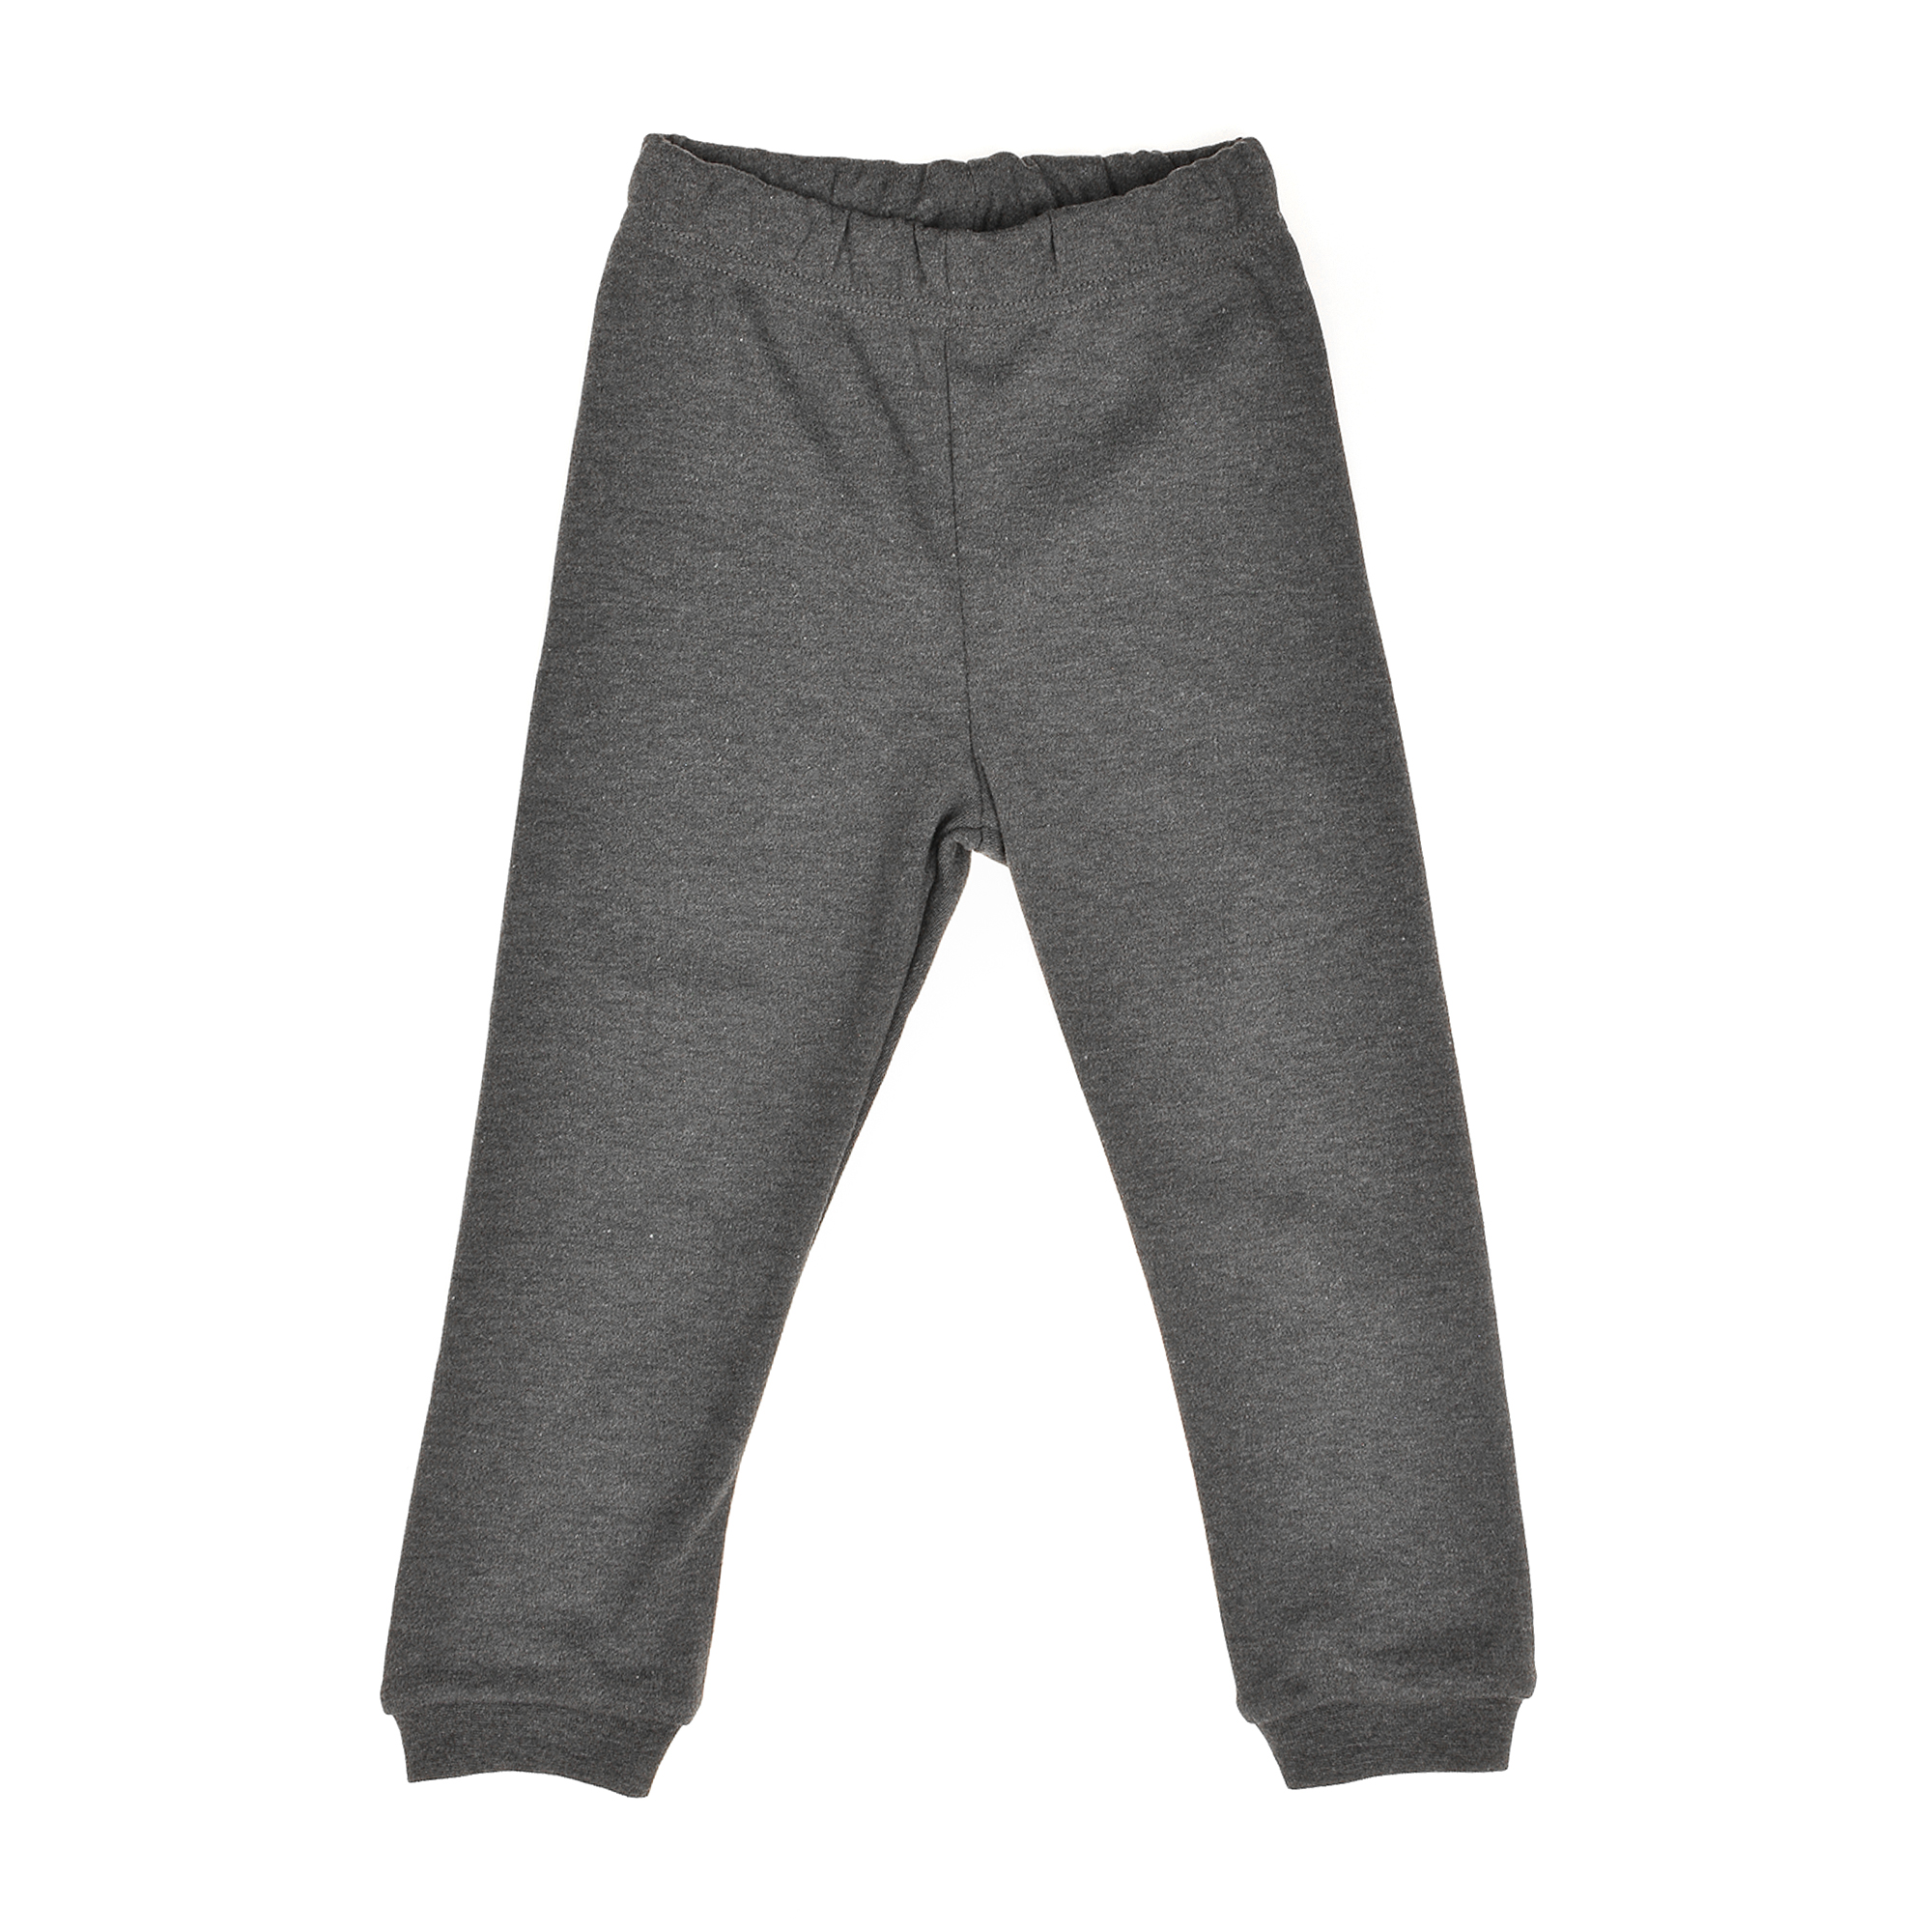 Пижама детские Robinzon модель 6MA~43253-2 цена, 2017